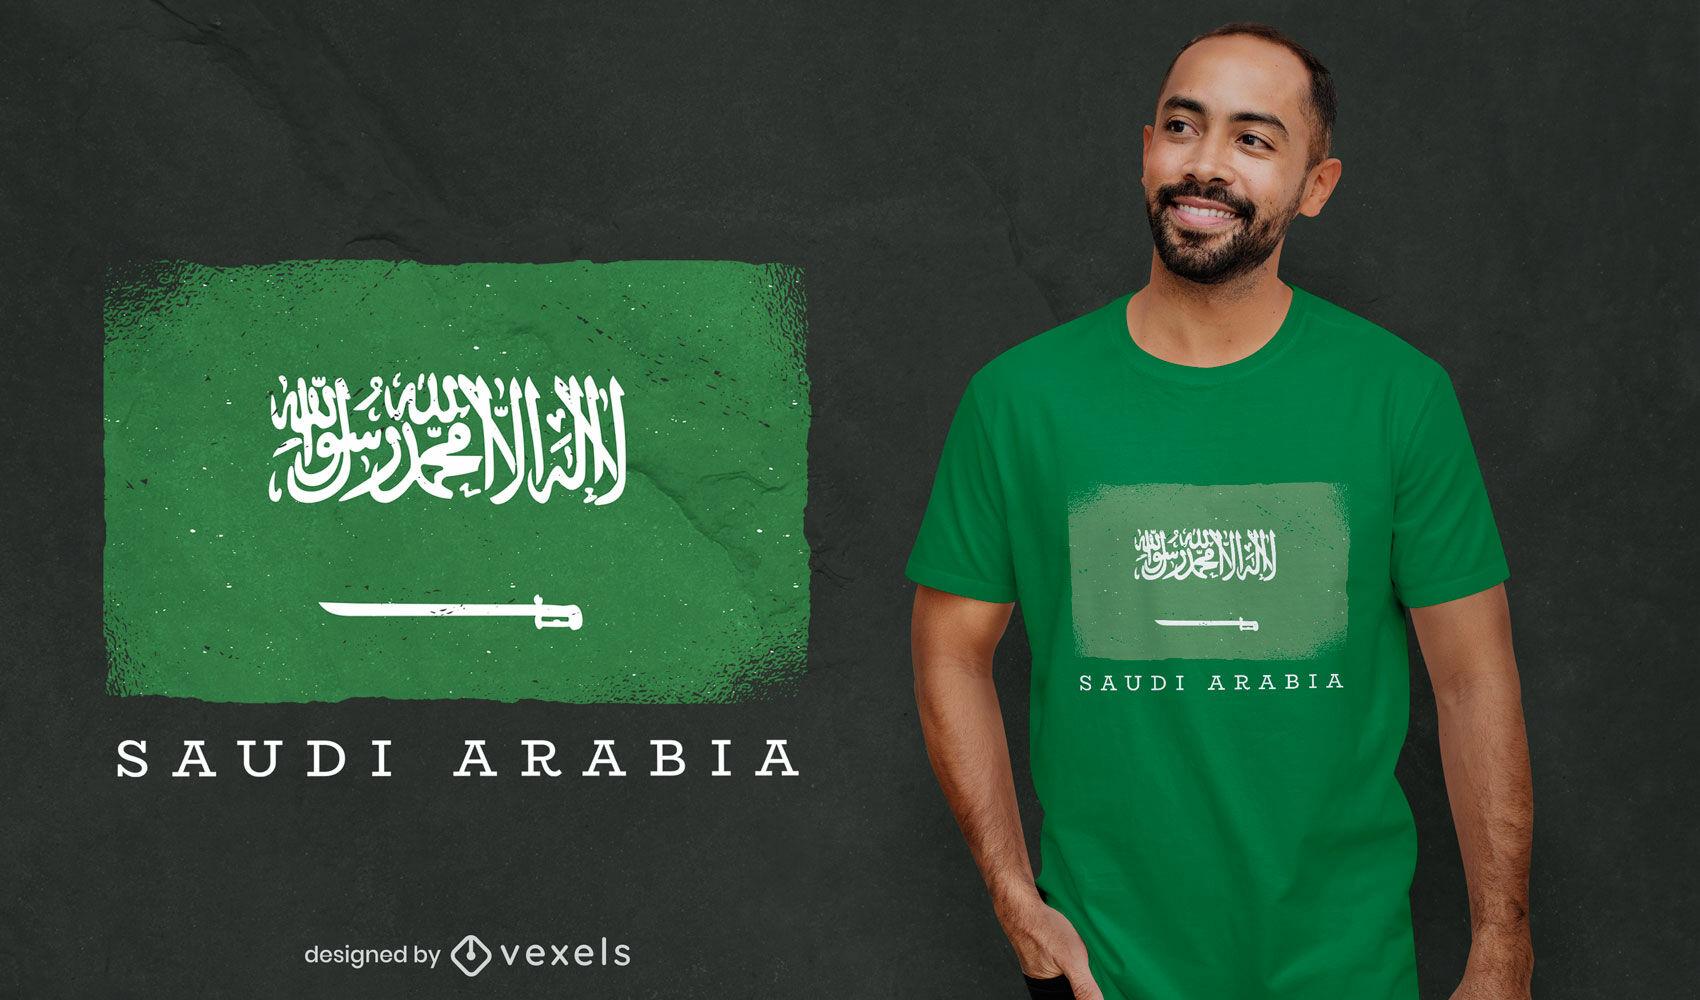 Saudi arabia country flag t-shirt design